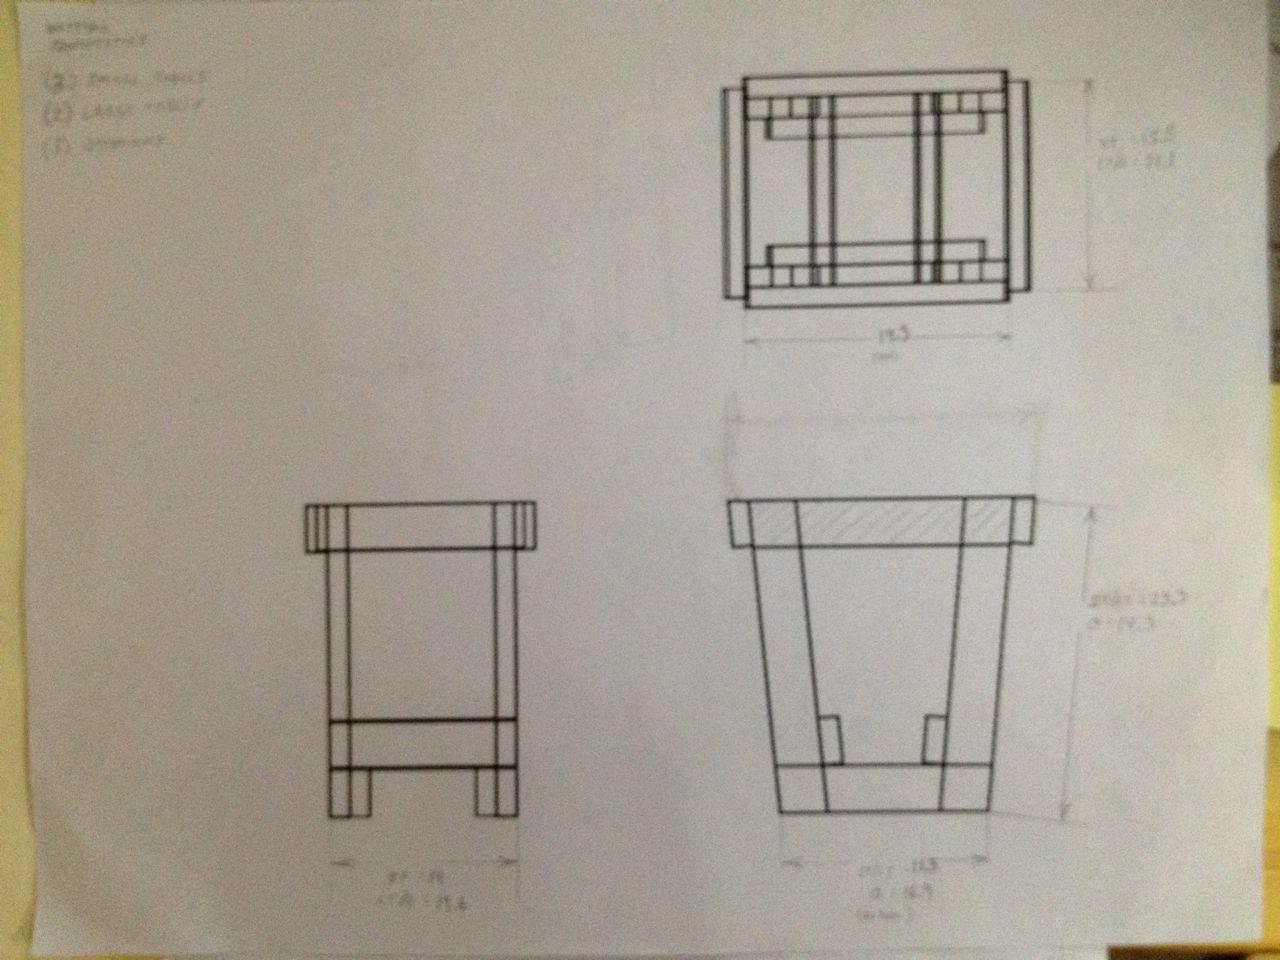 The blueprint furniture gallery blueprint design and the blueprints the blueprint furniture gallery blueprint design and malvernweather Images